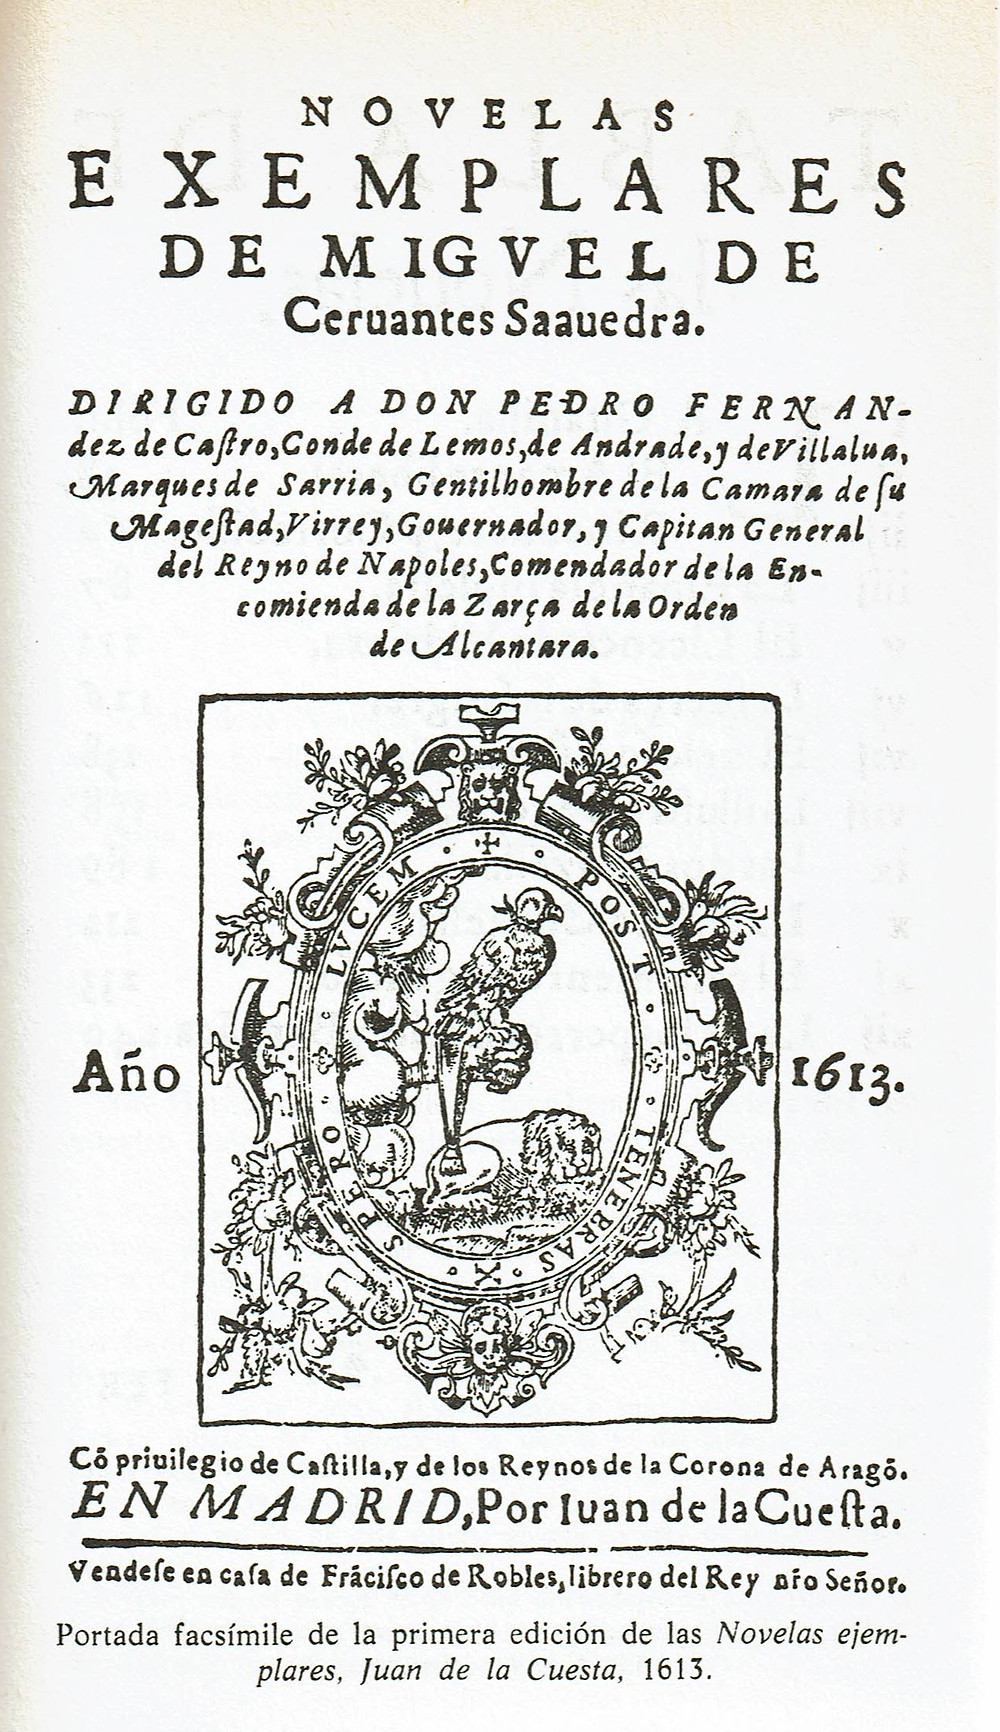 Novelas ejemplares de Miguel de Cervantes. Instituto Cervantes.